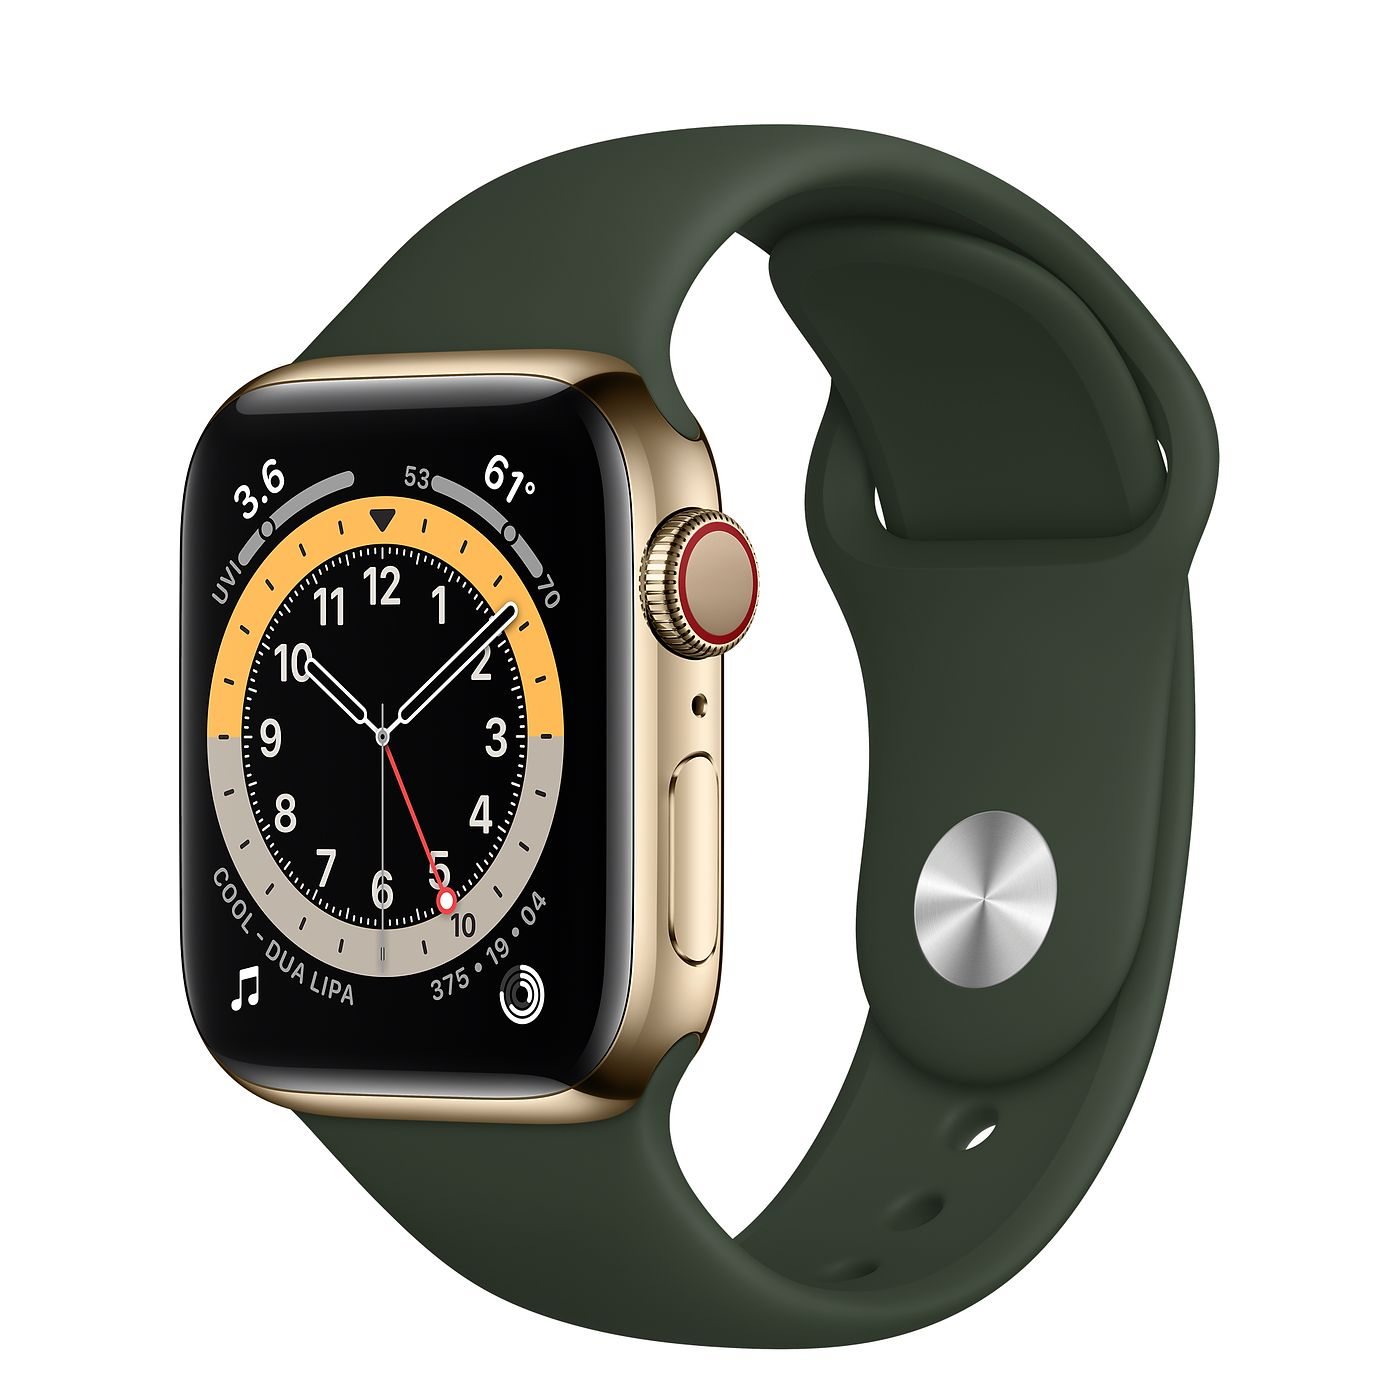 Apple 애플워치 6, GPS+Cellular, 골드 스테인리스 스틸 케이스, 사이프러스 그린 스포츠 밴드